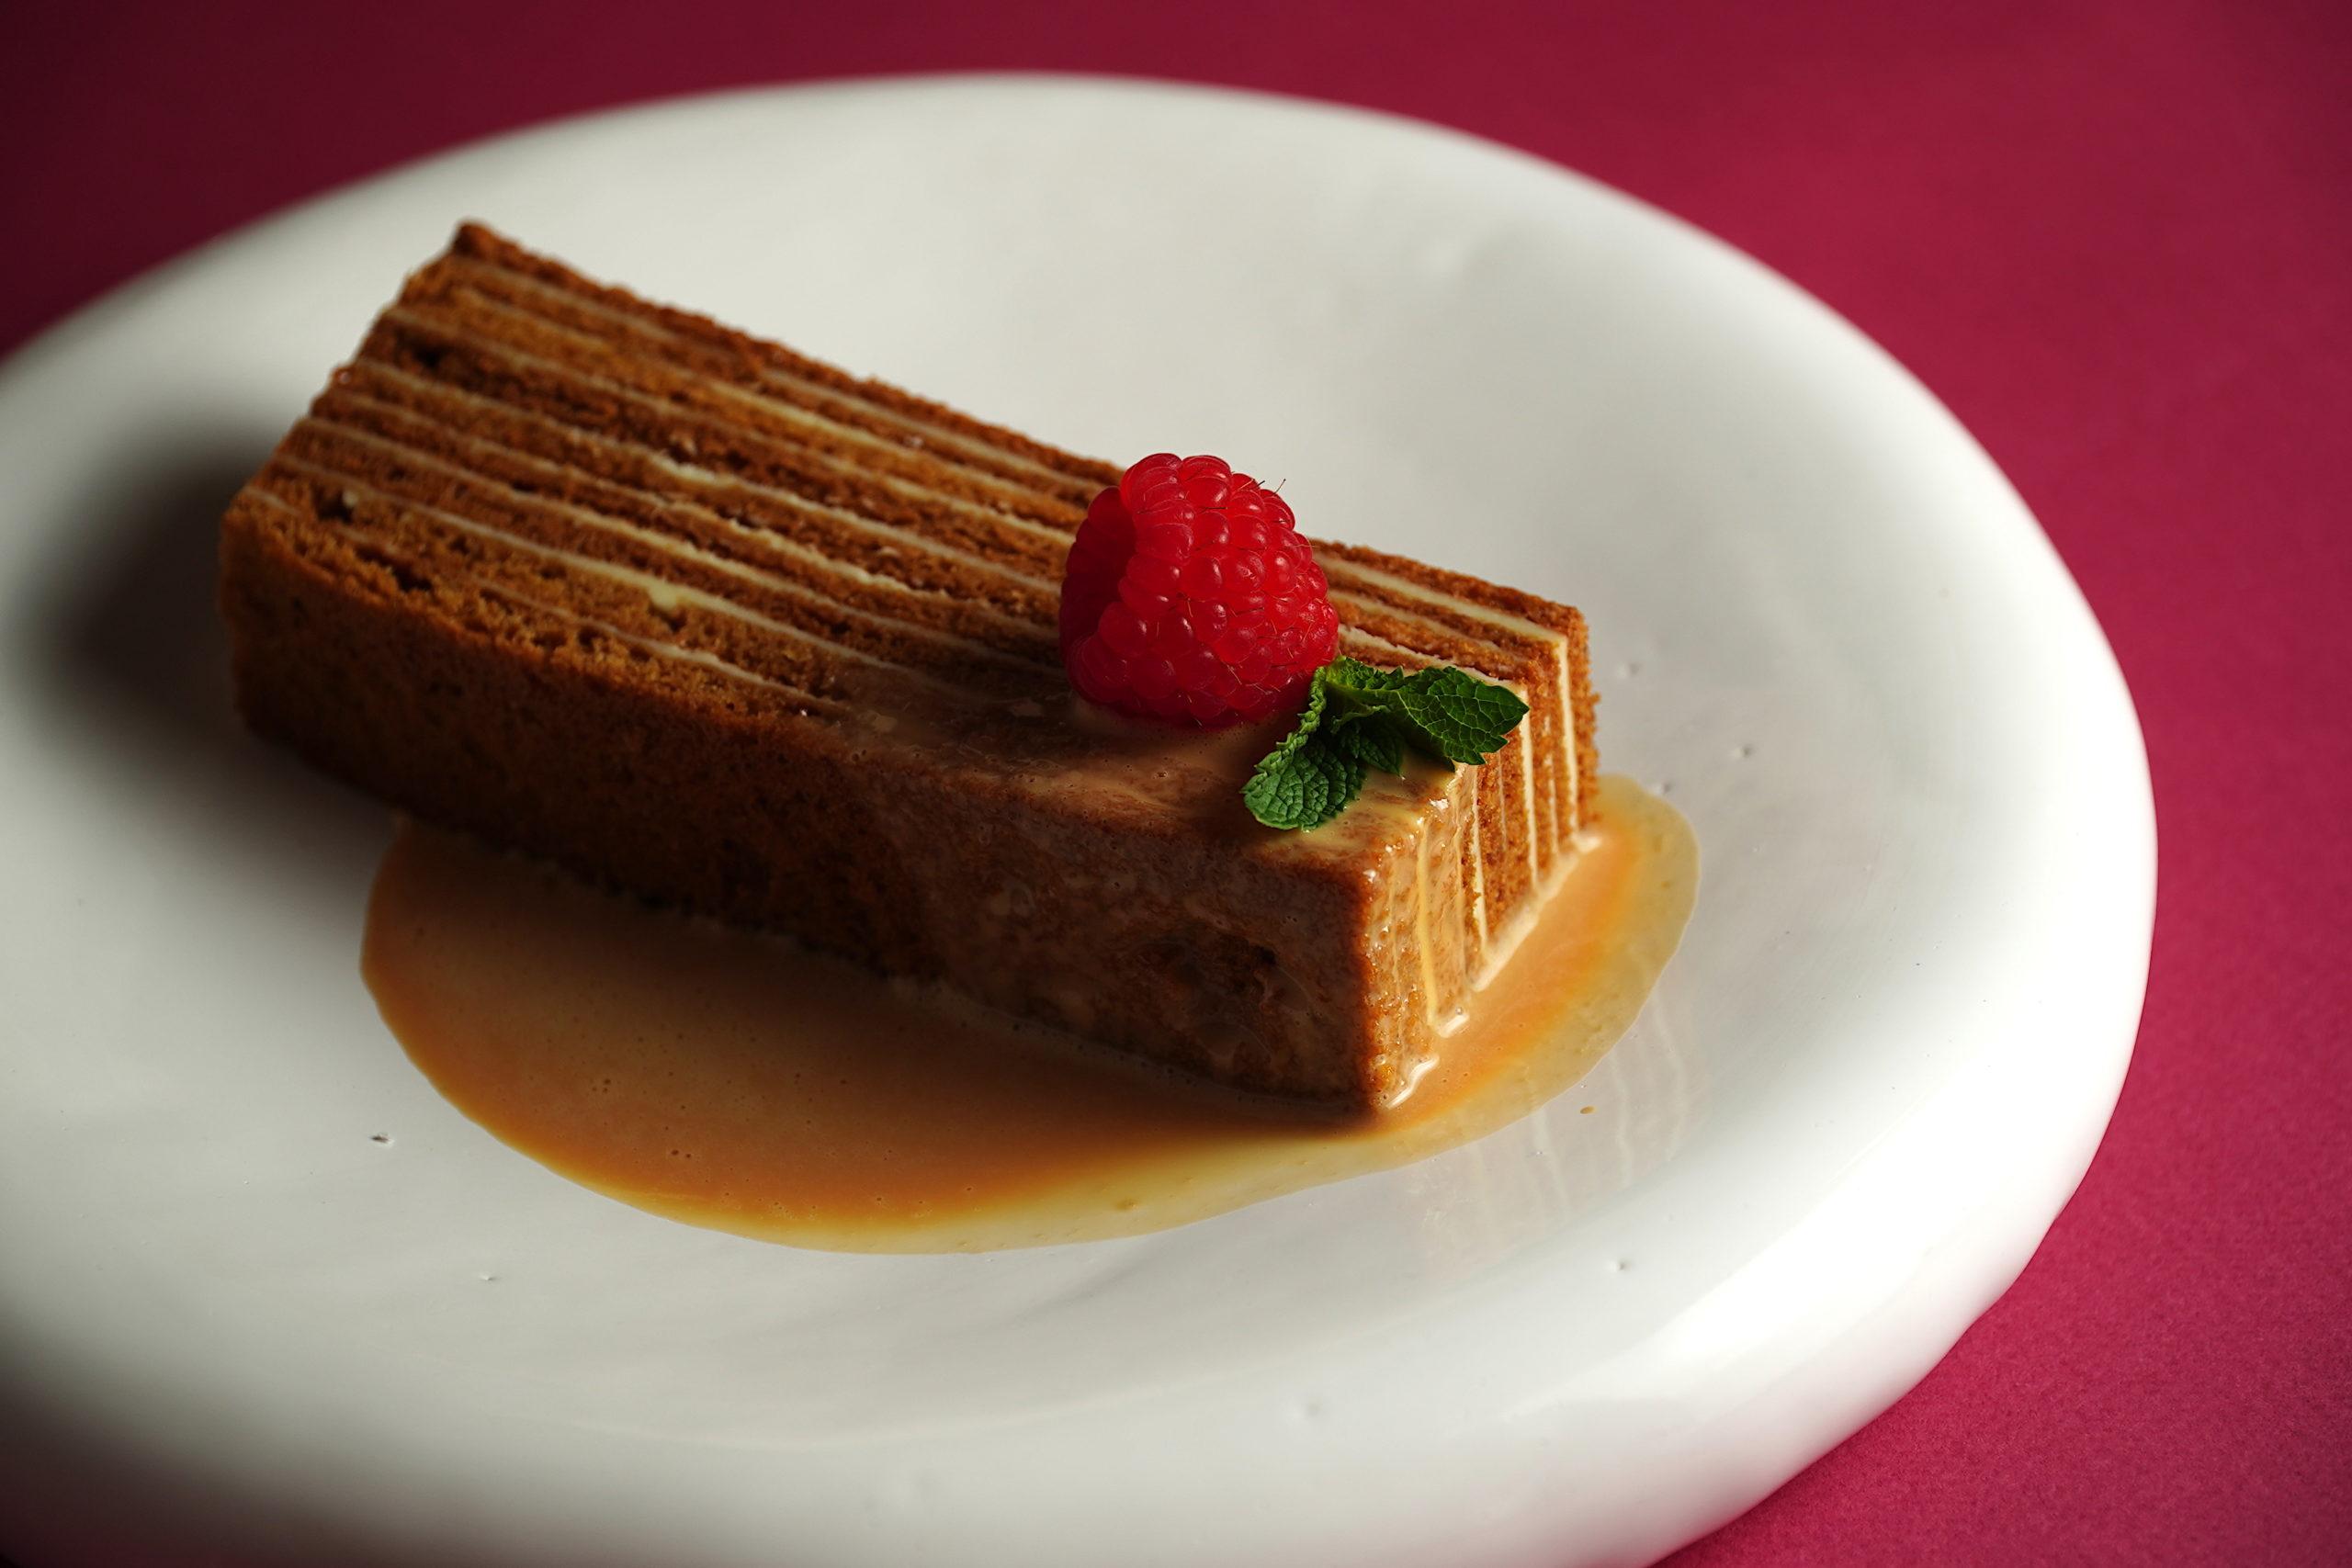 Нео-бистро Hands: медовик и черничный торт для тех, кто на диете